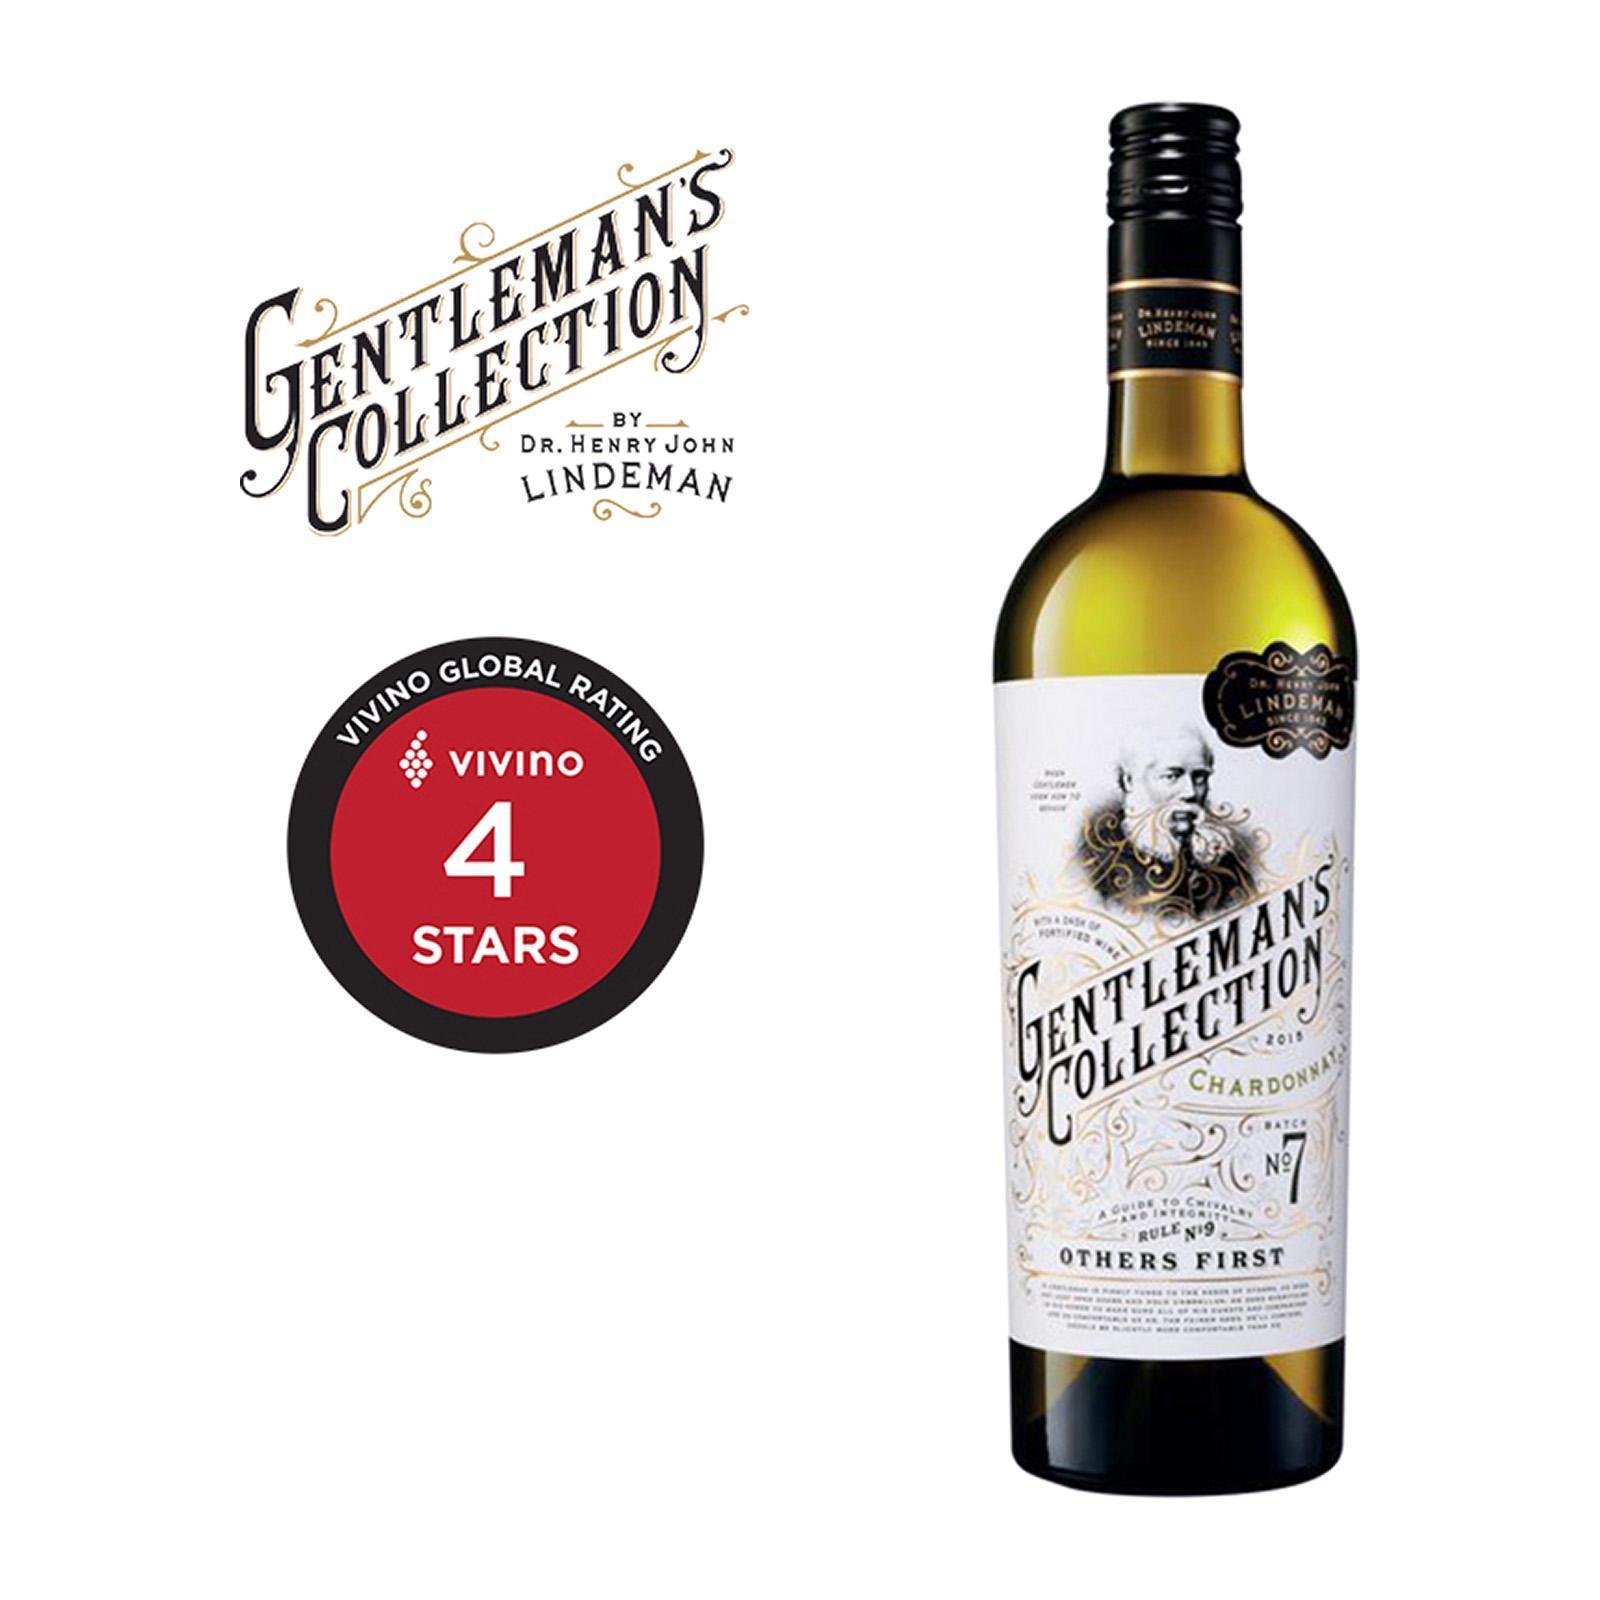 Lindeman's Gentleman's Collection Chardonnay Wine